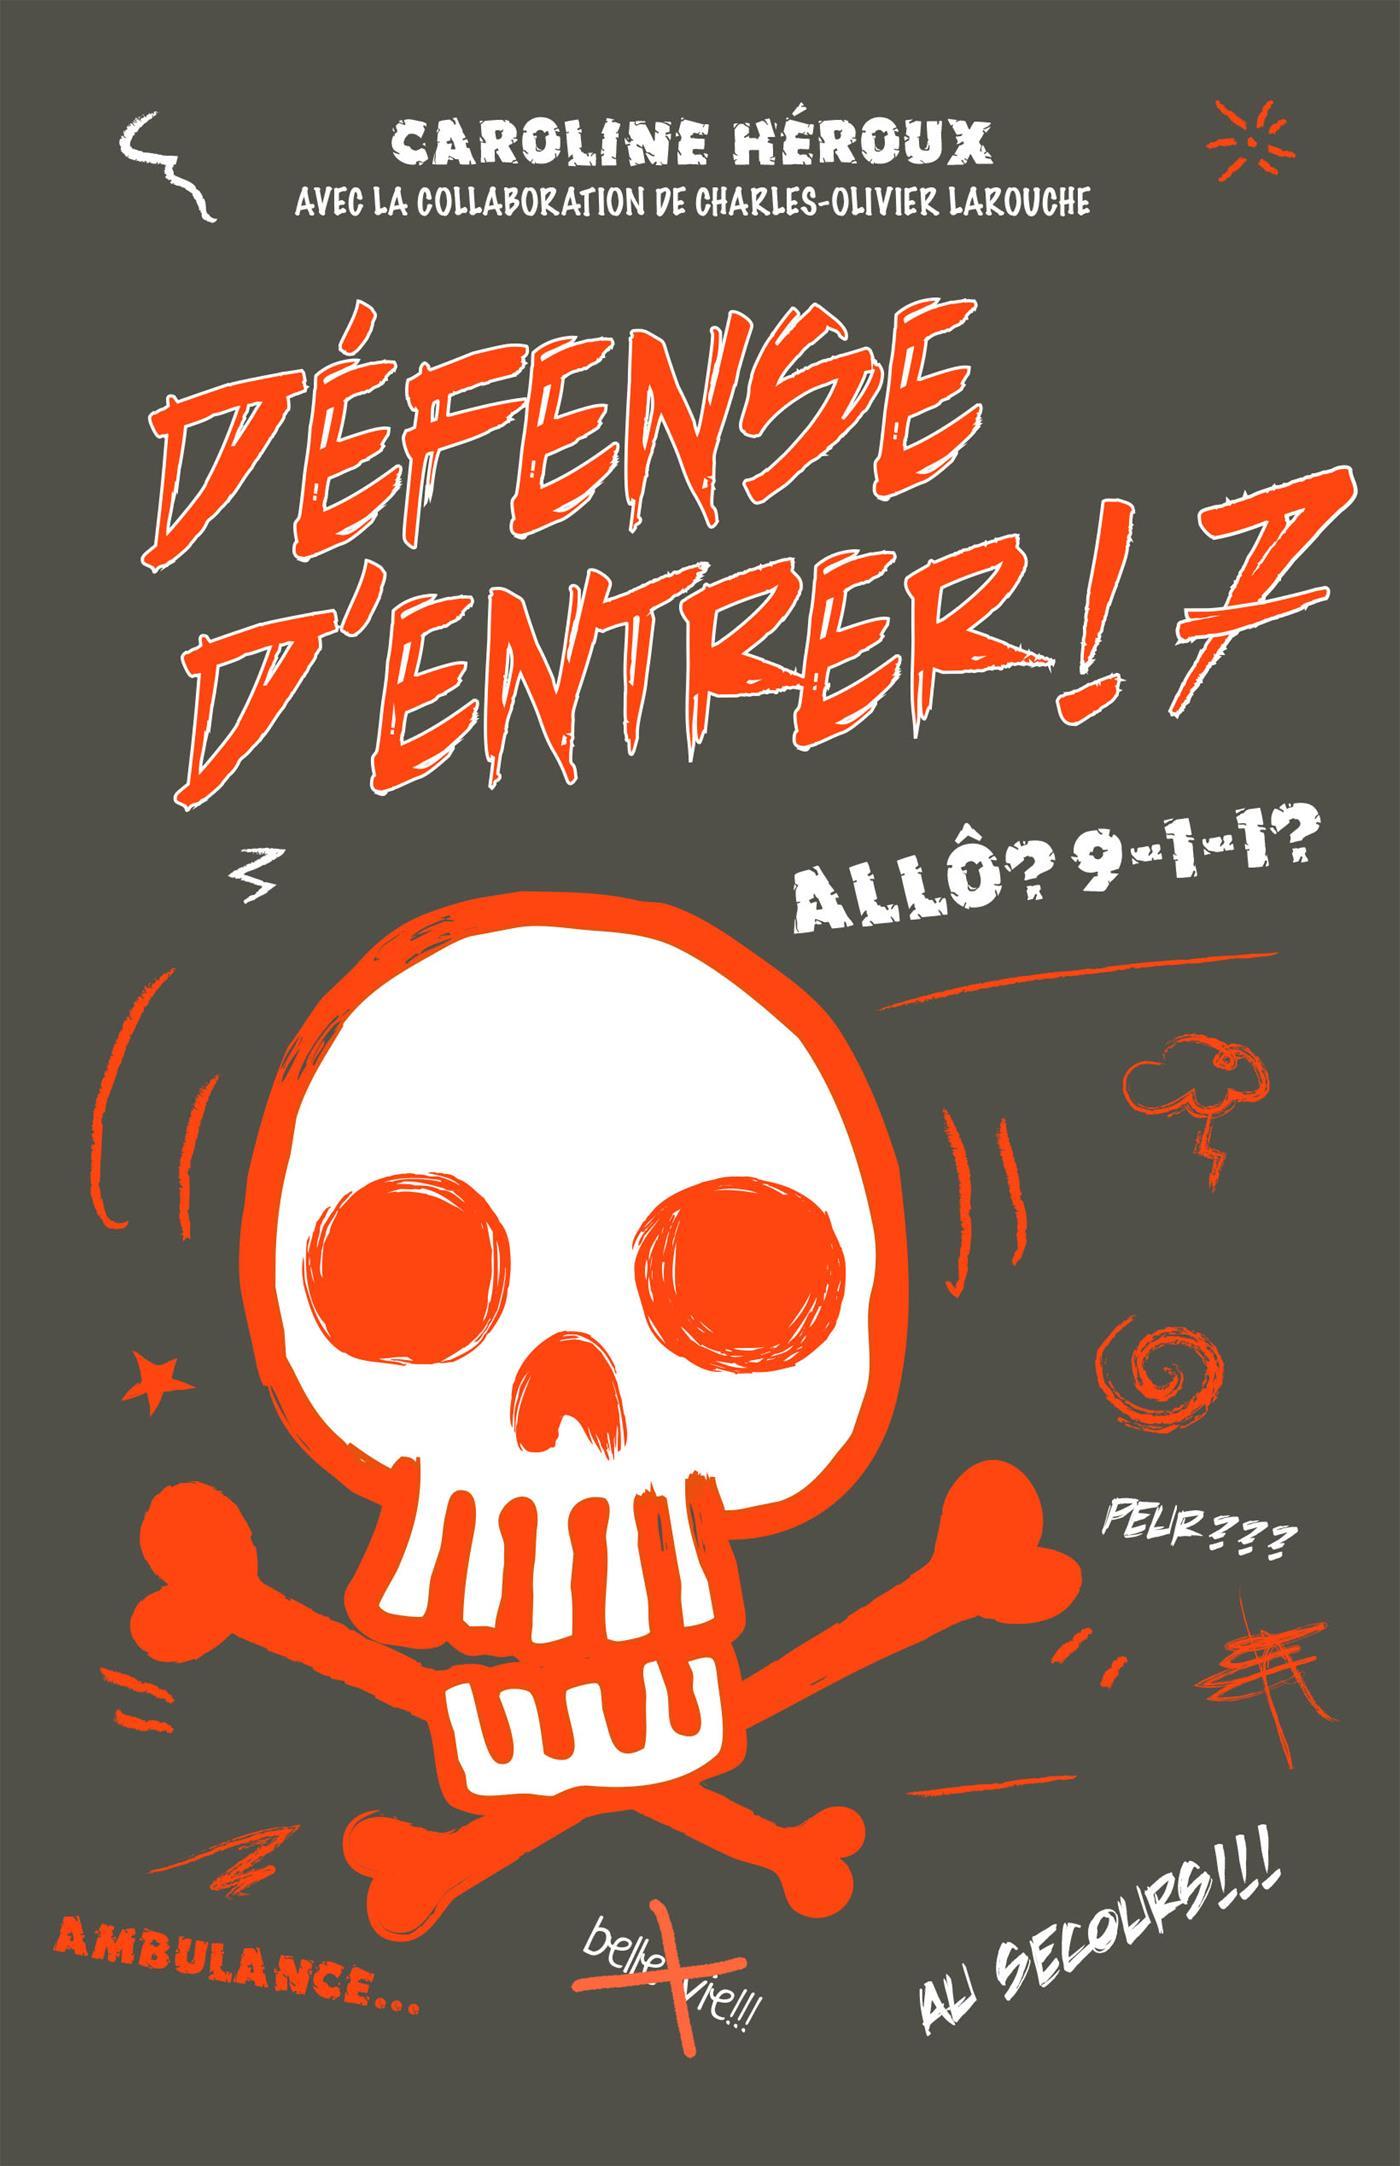 Défense d'entrer ! 7